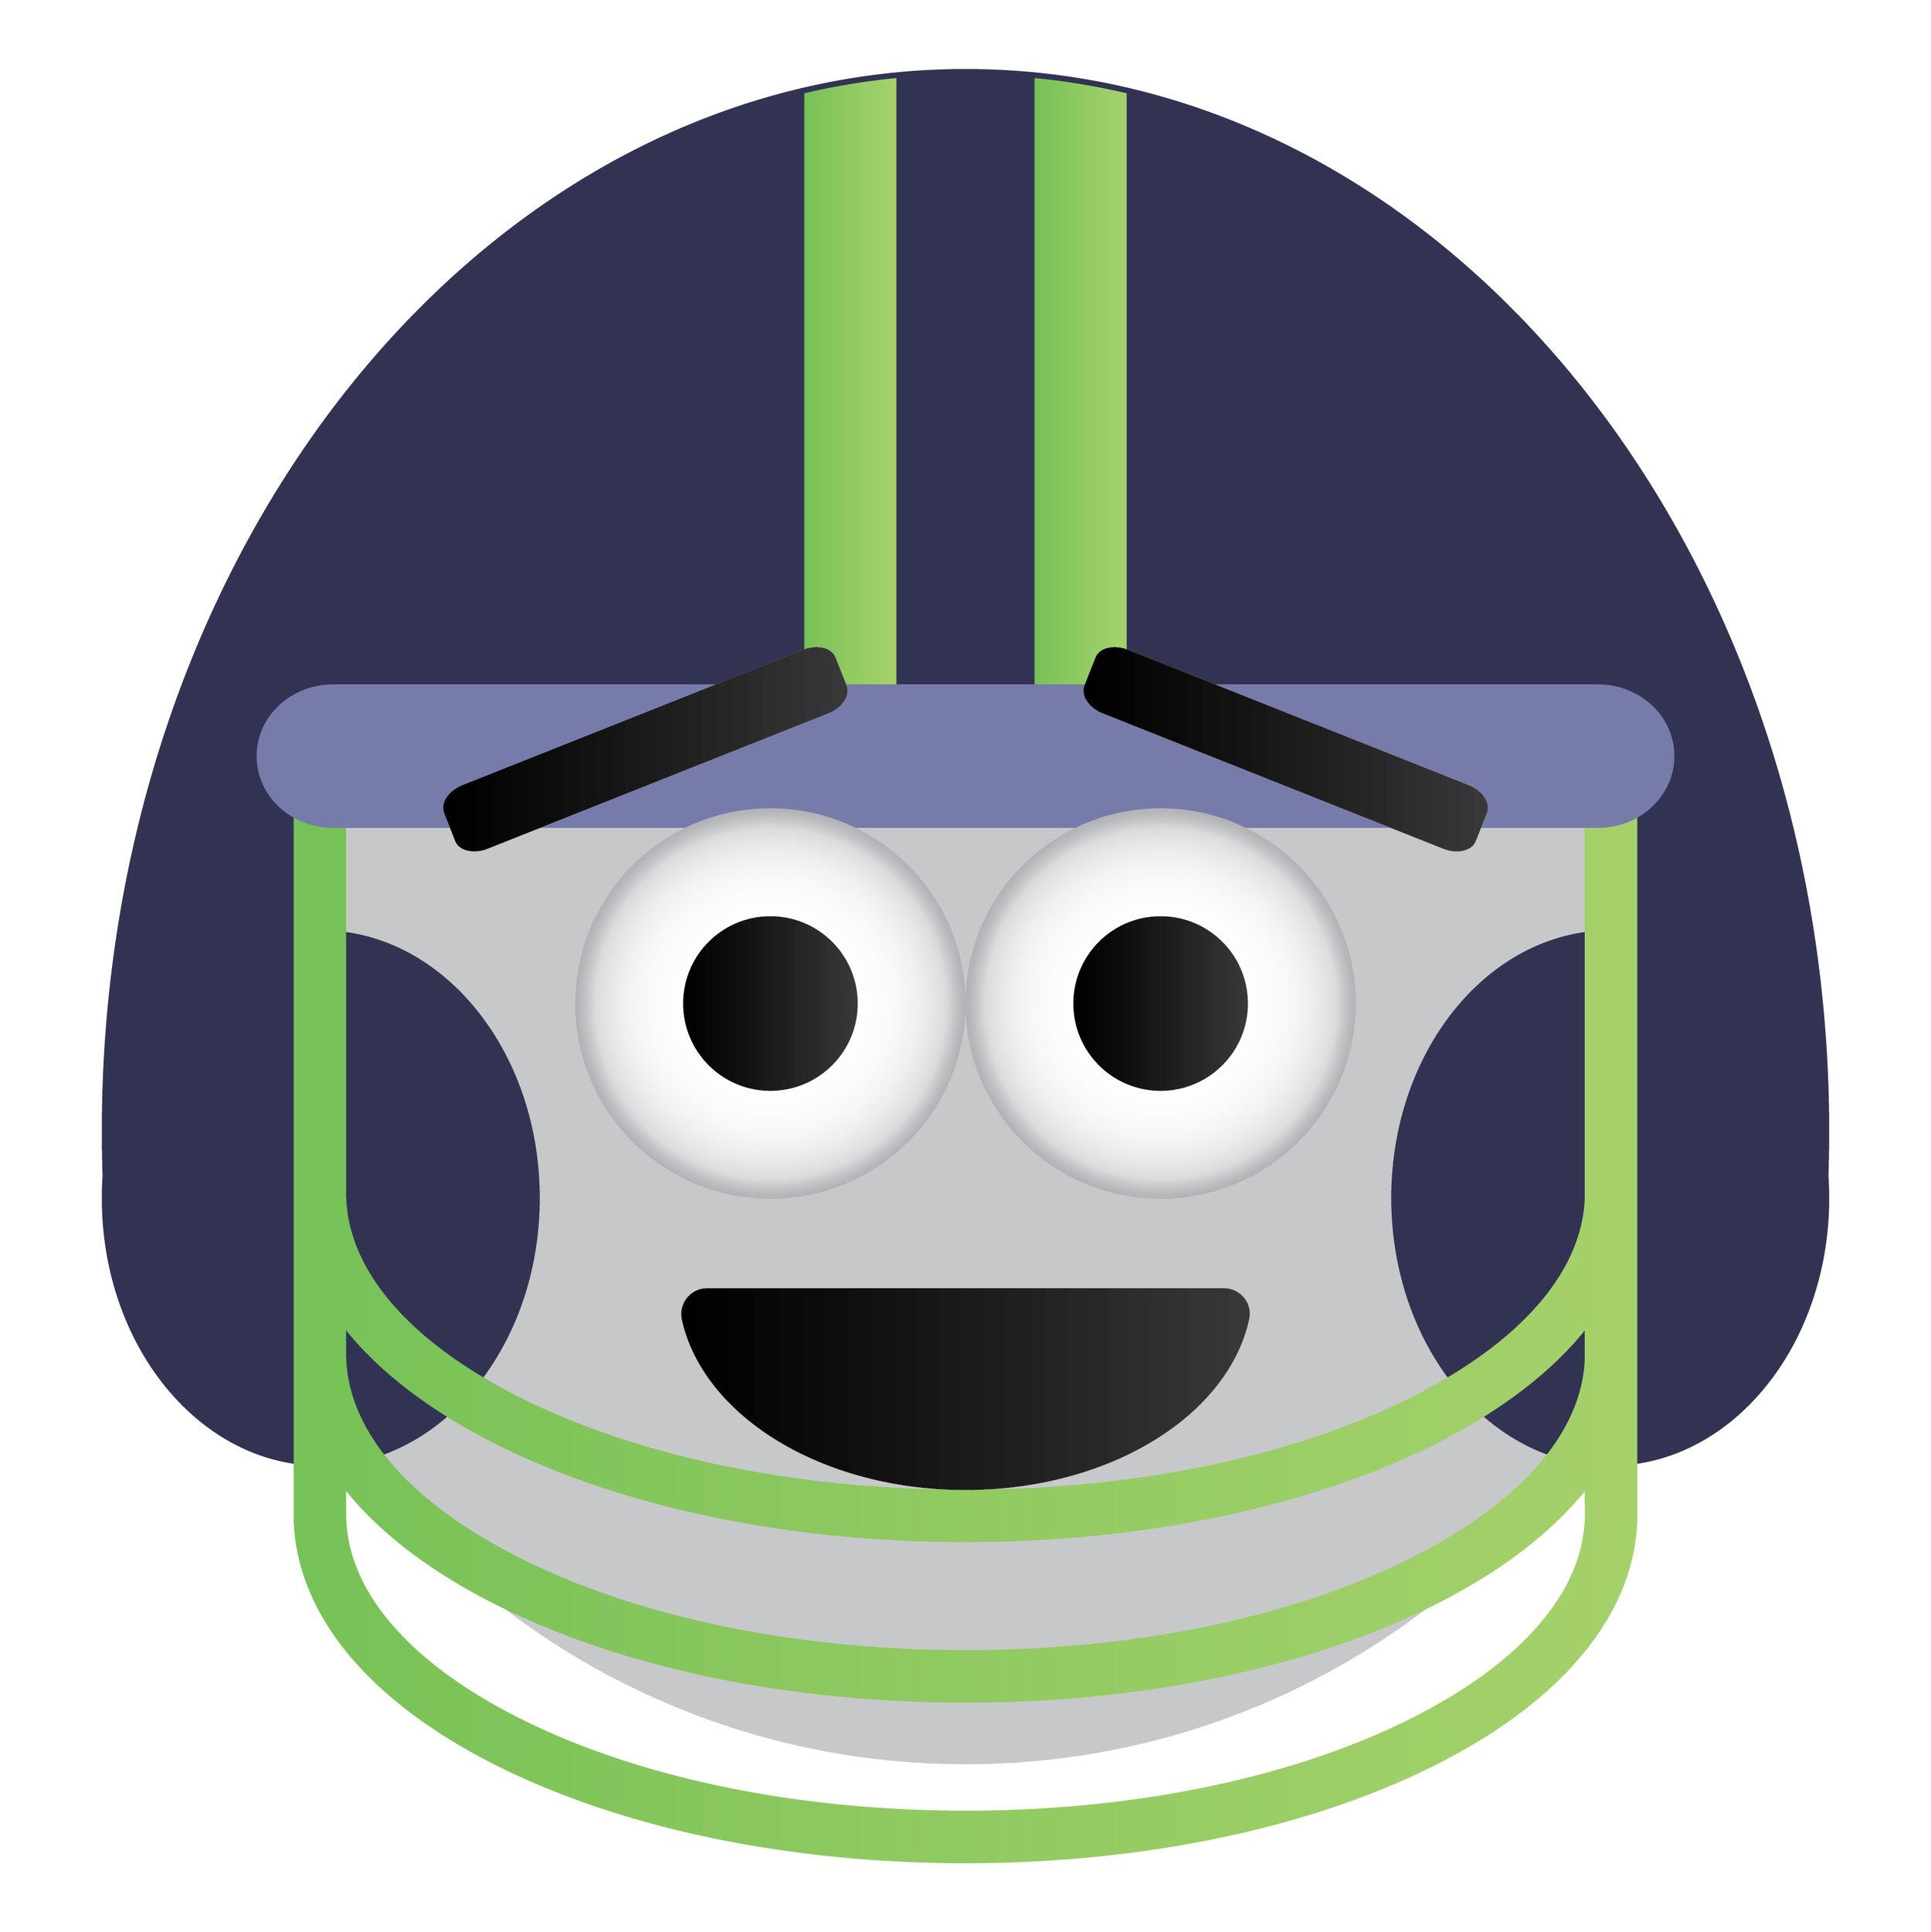 Emojis_Fall2018 [Recovered]_DM_Emoji_6.jpg